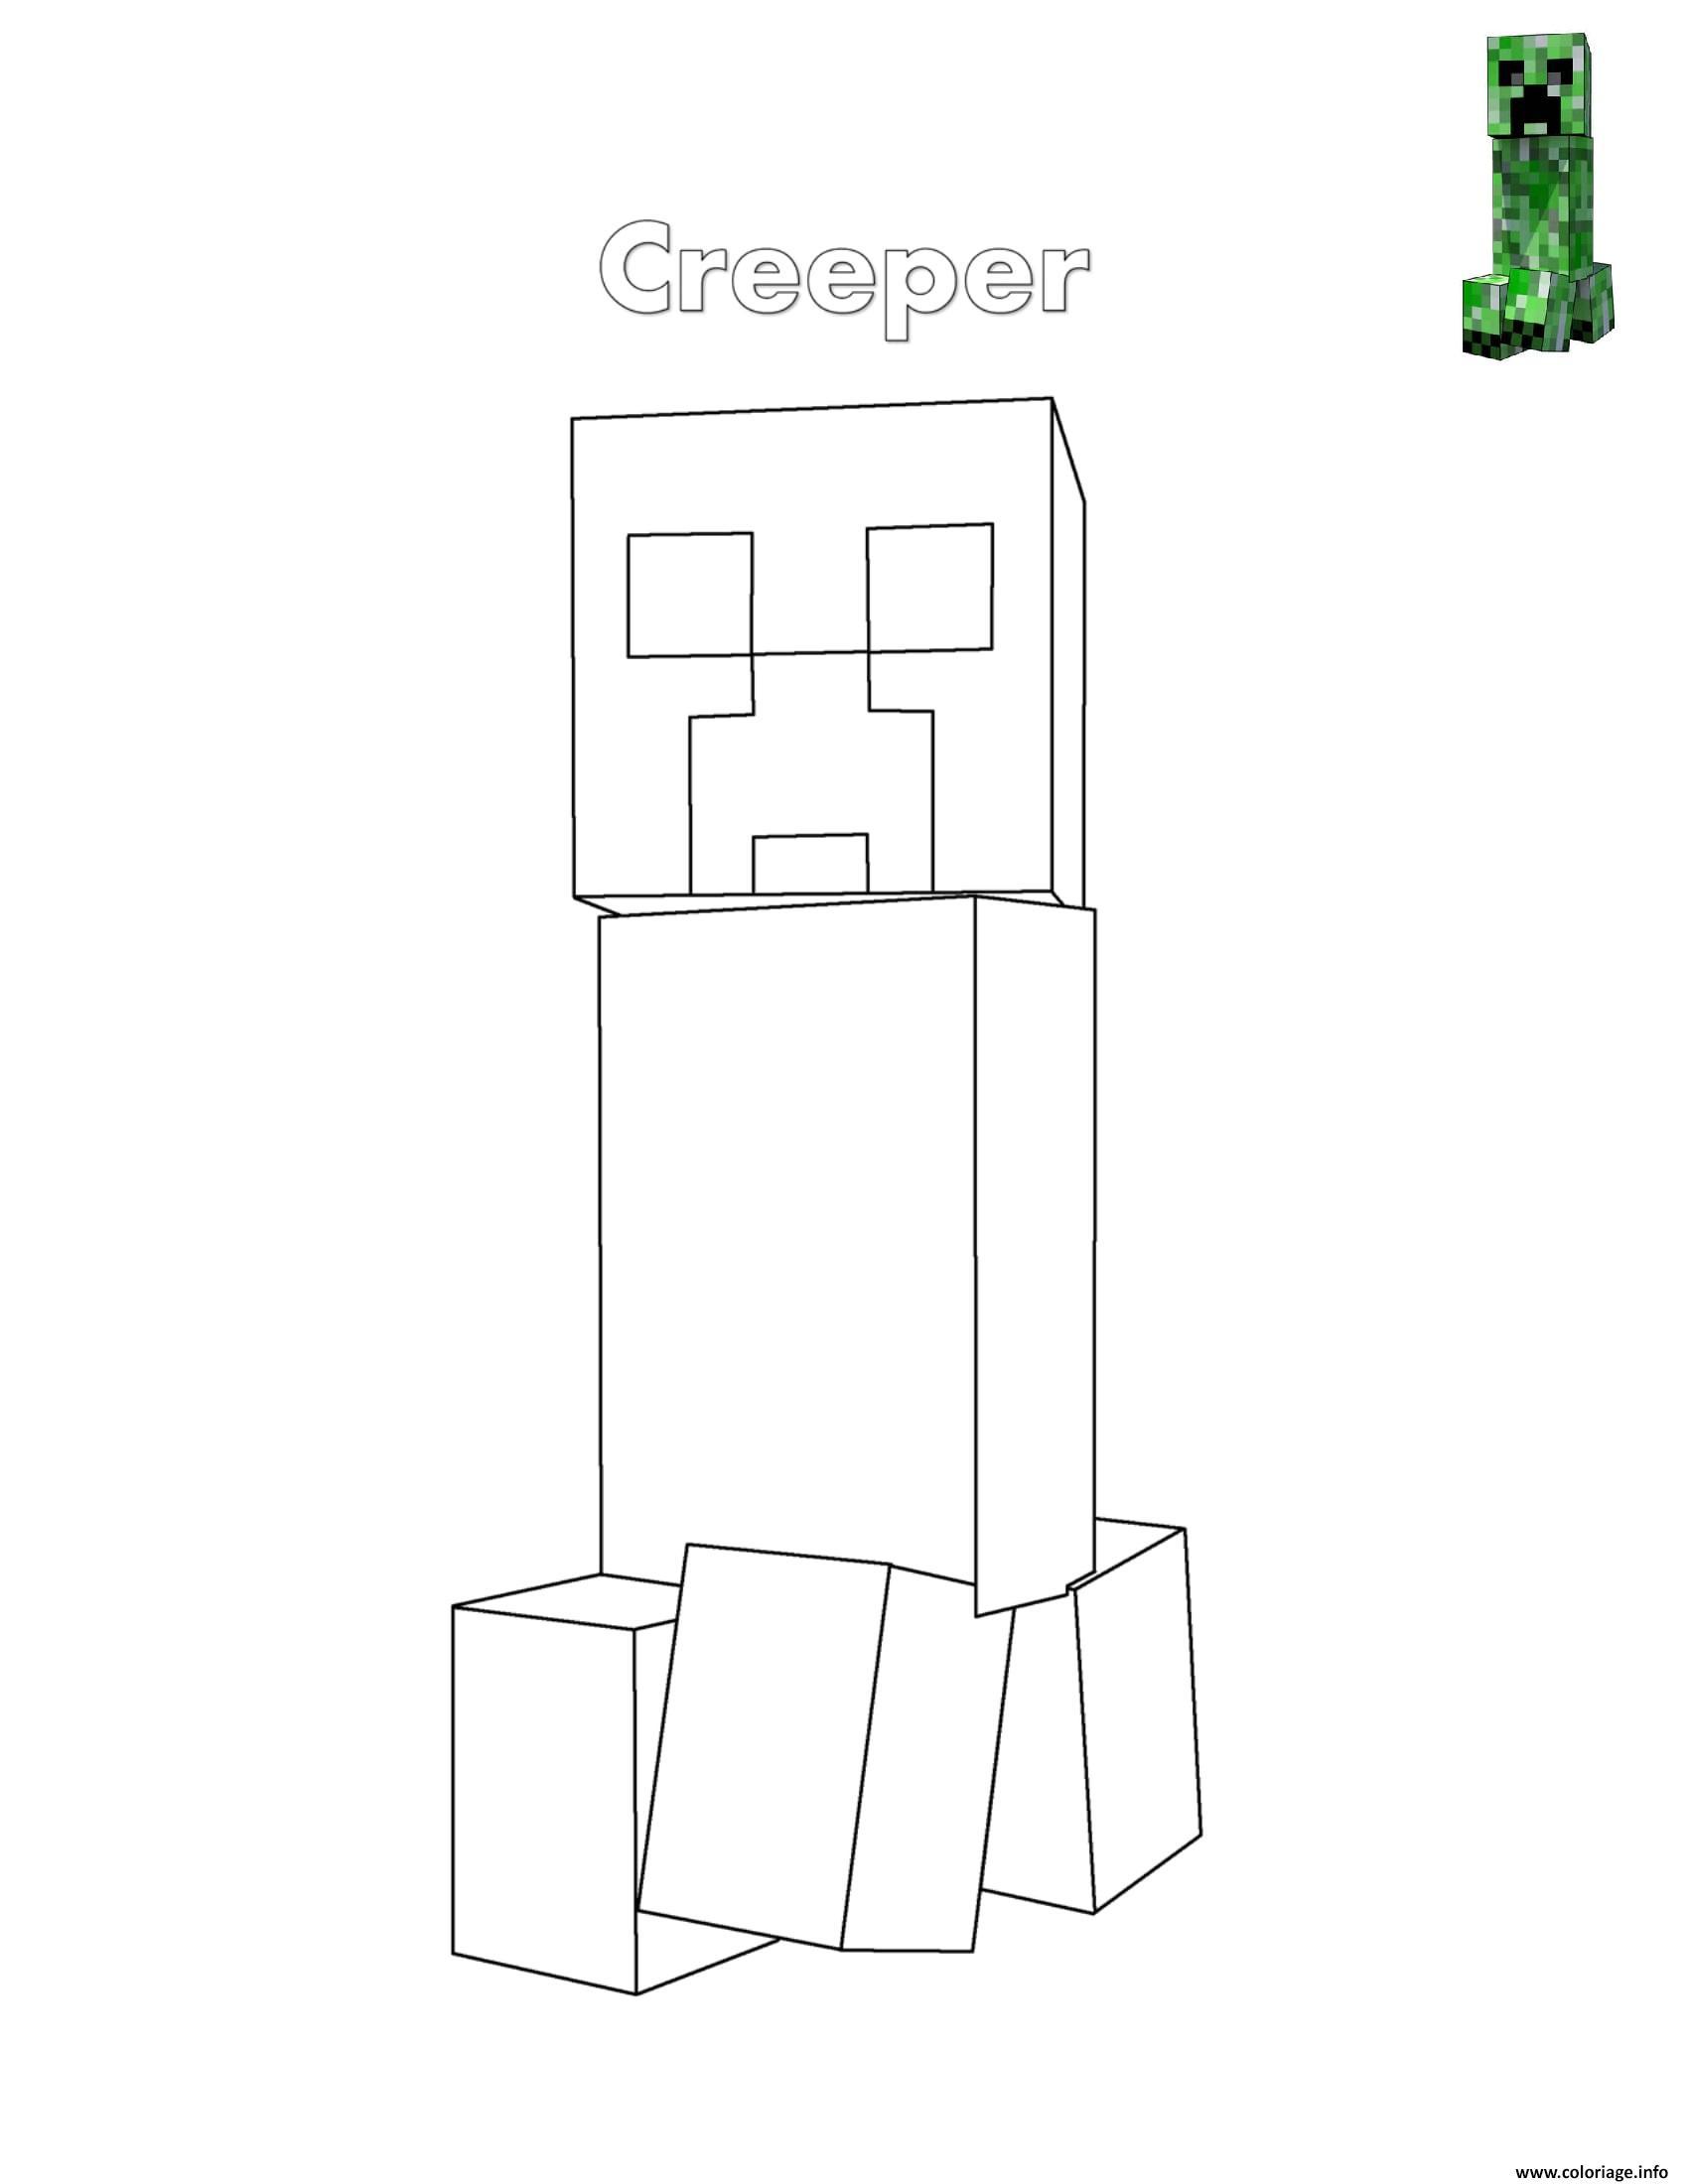 Dessin Creeper de minecraft Coloriage Gratuit à Imprimer